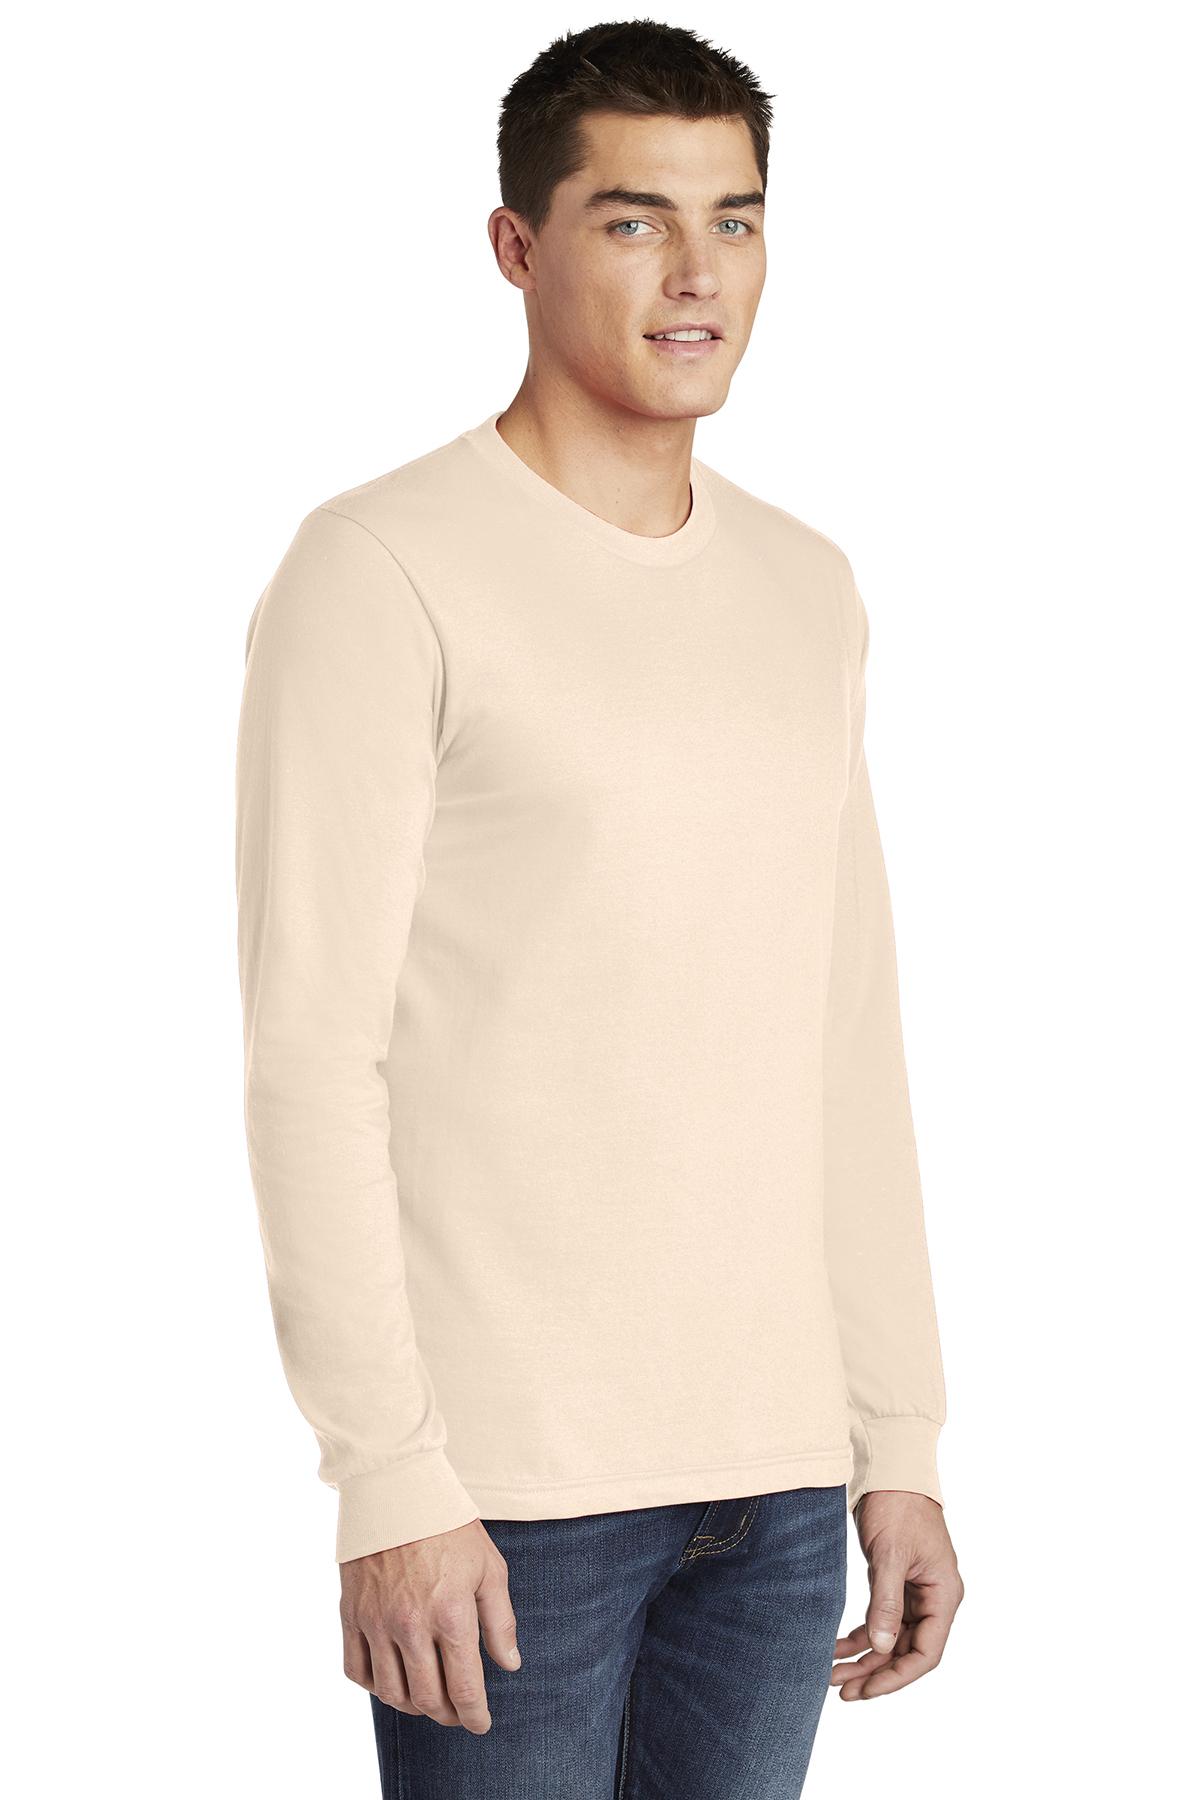 American Apparel ® Fine Jersey Long Sleeve T-Shirt  28377997484f